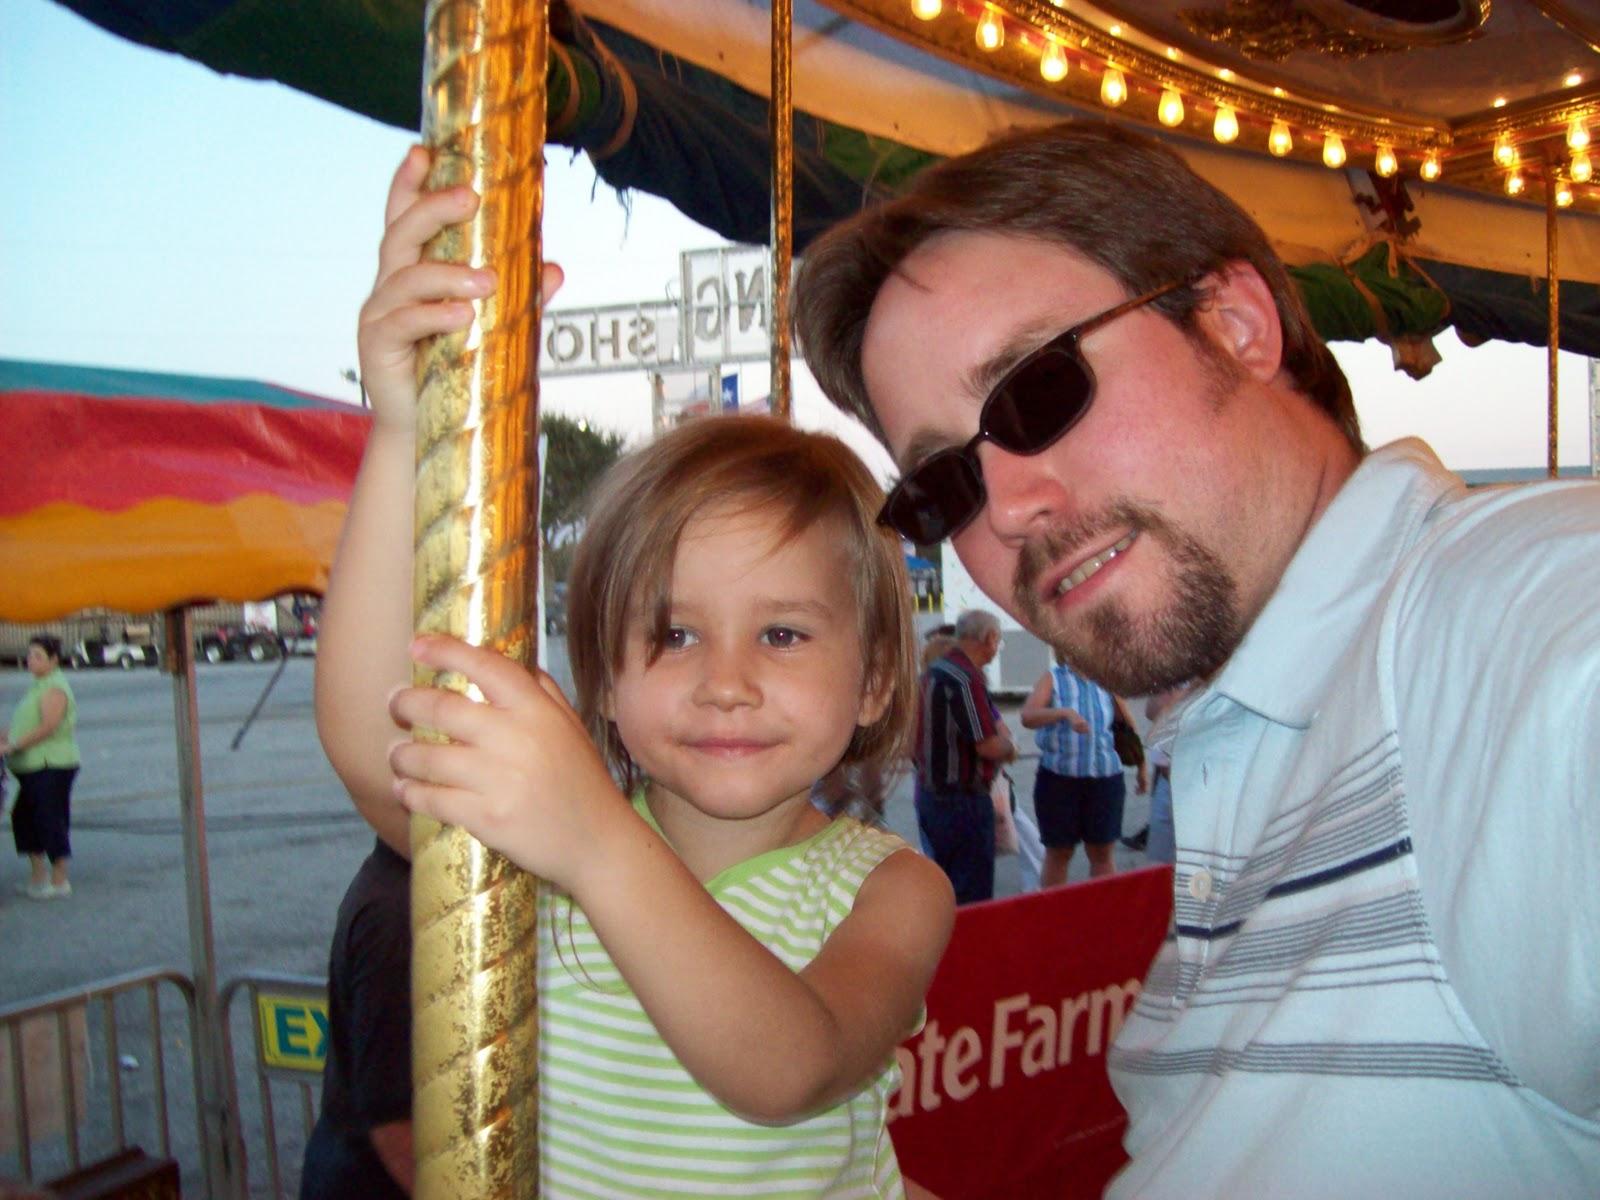 Fort Bend County Fair 2008 - 101_0436.JPG